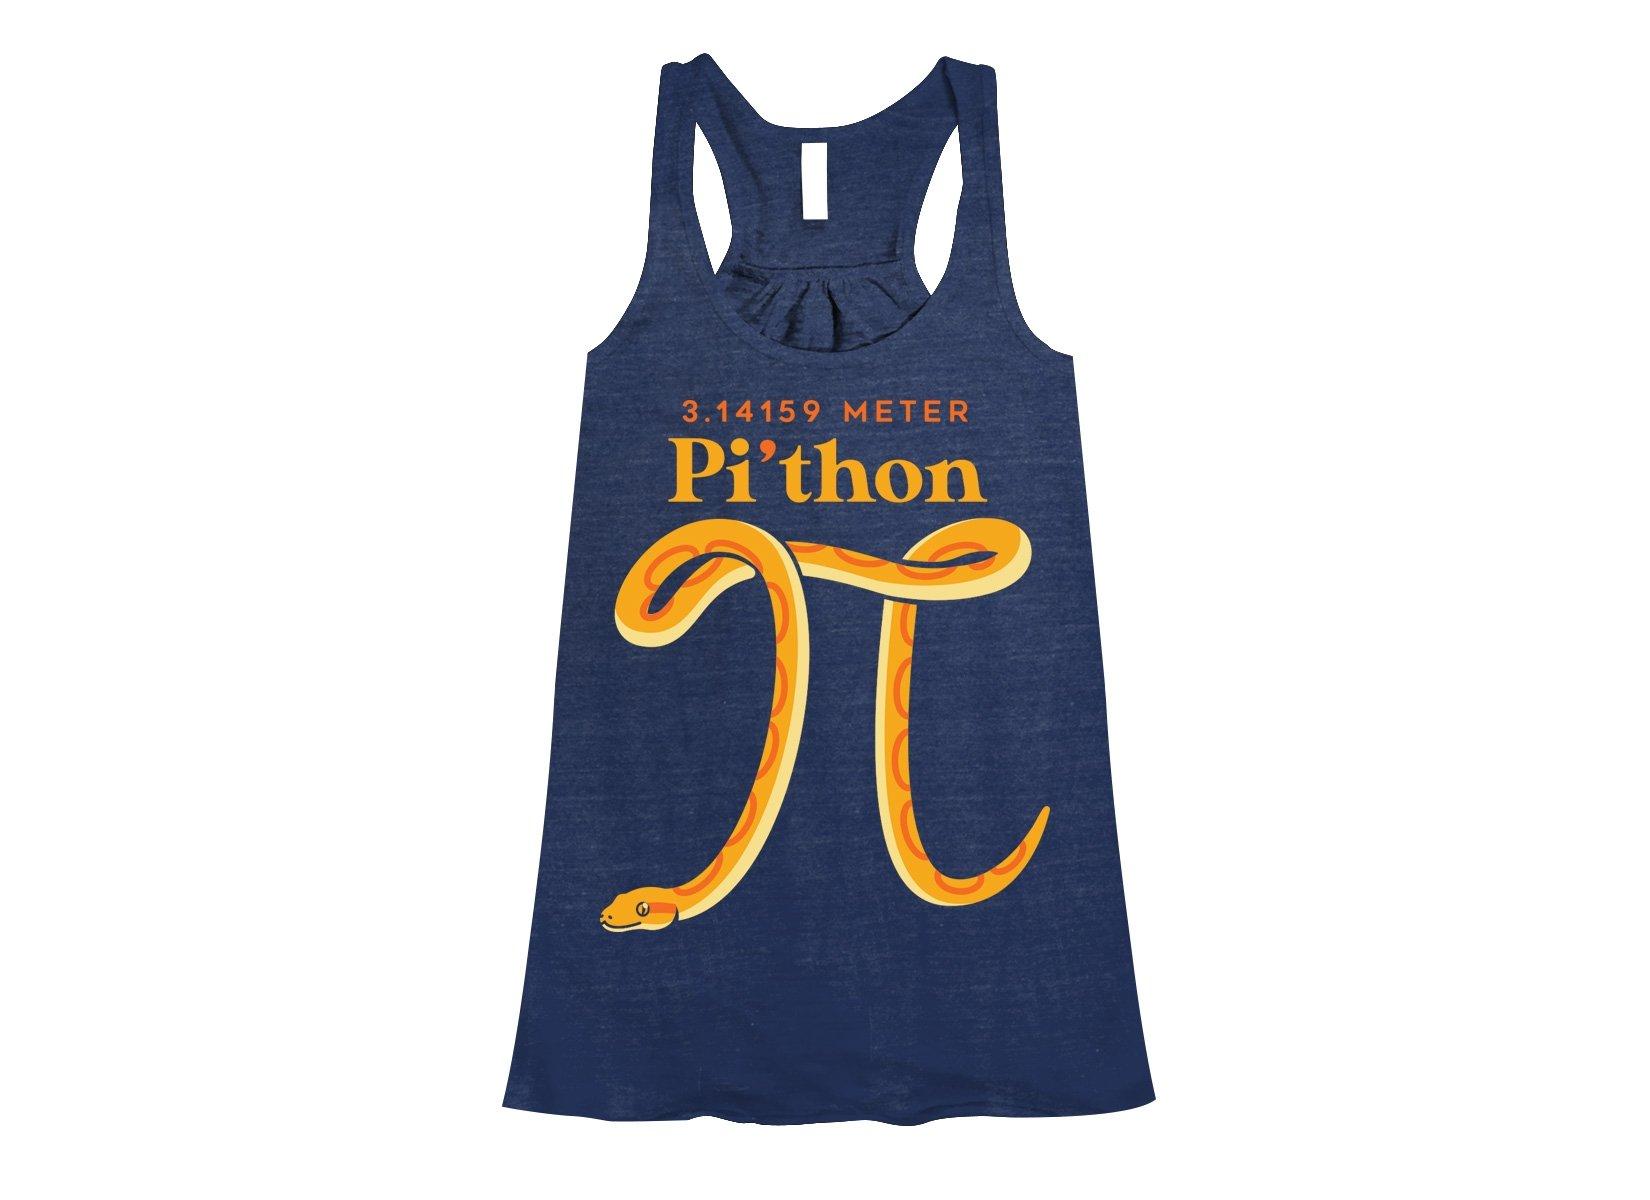 Pi-thon on Womens Tanks T-Shirt